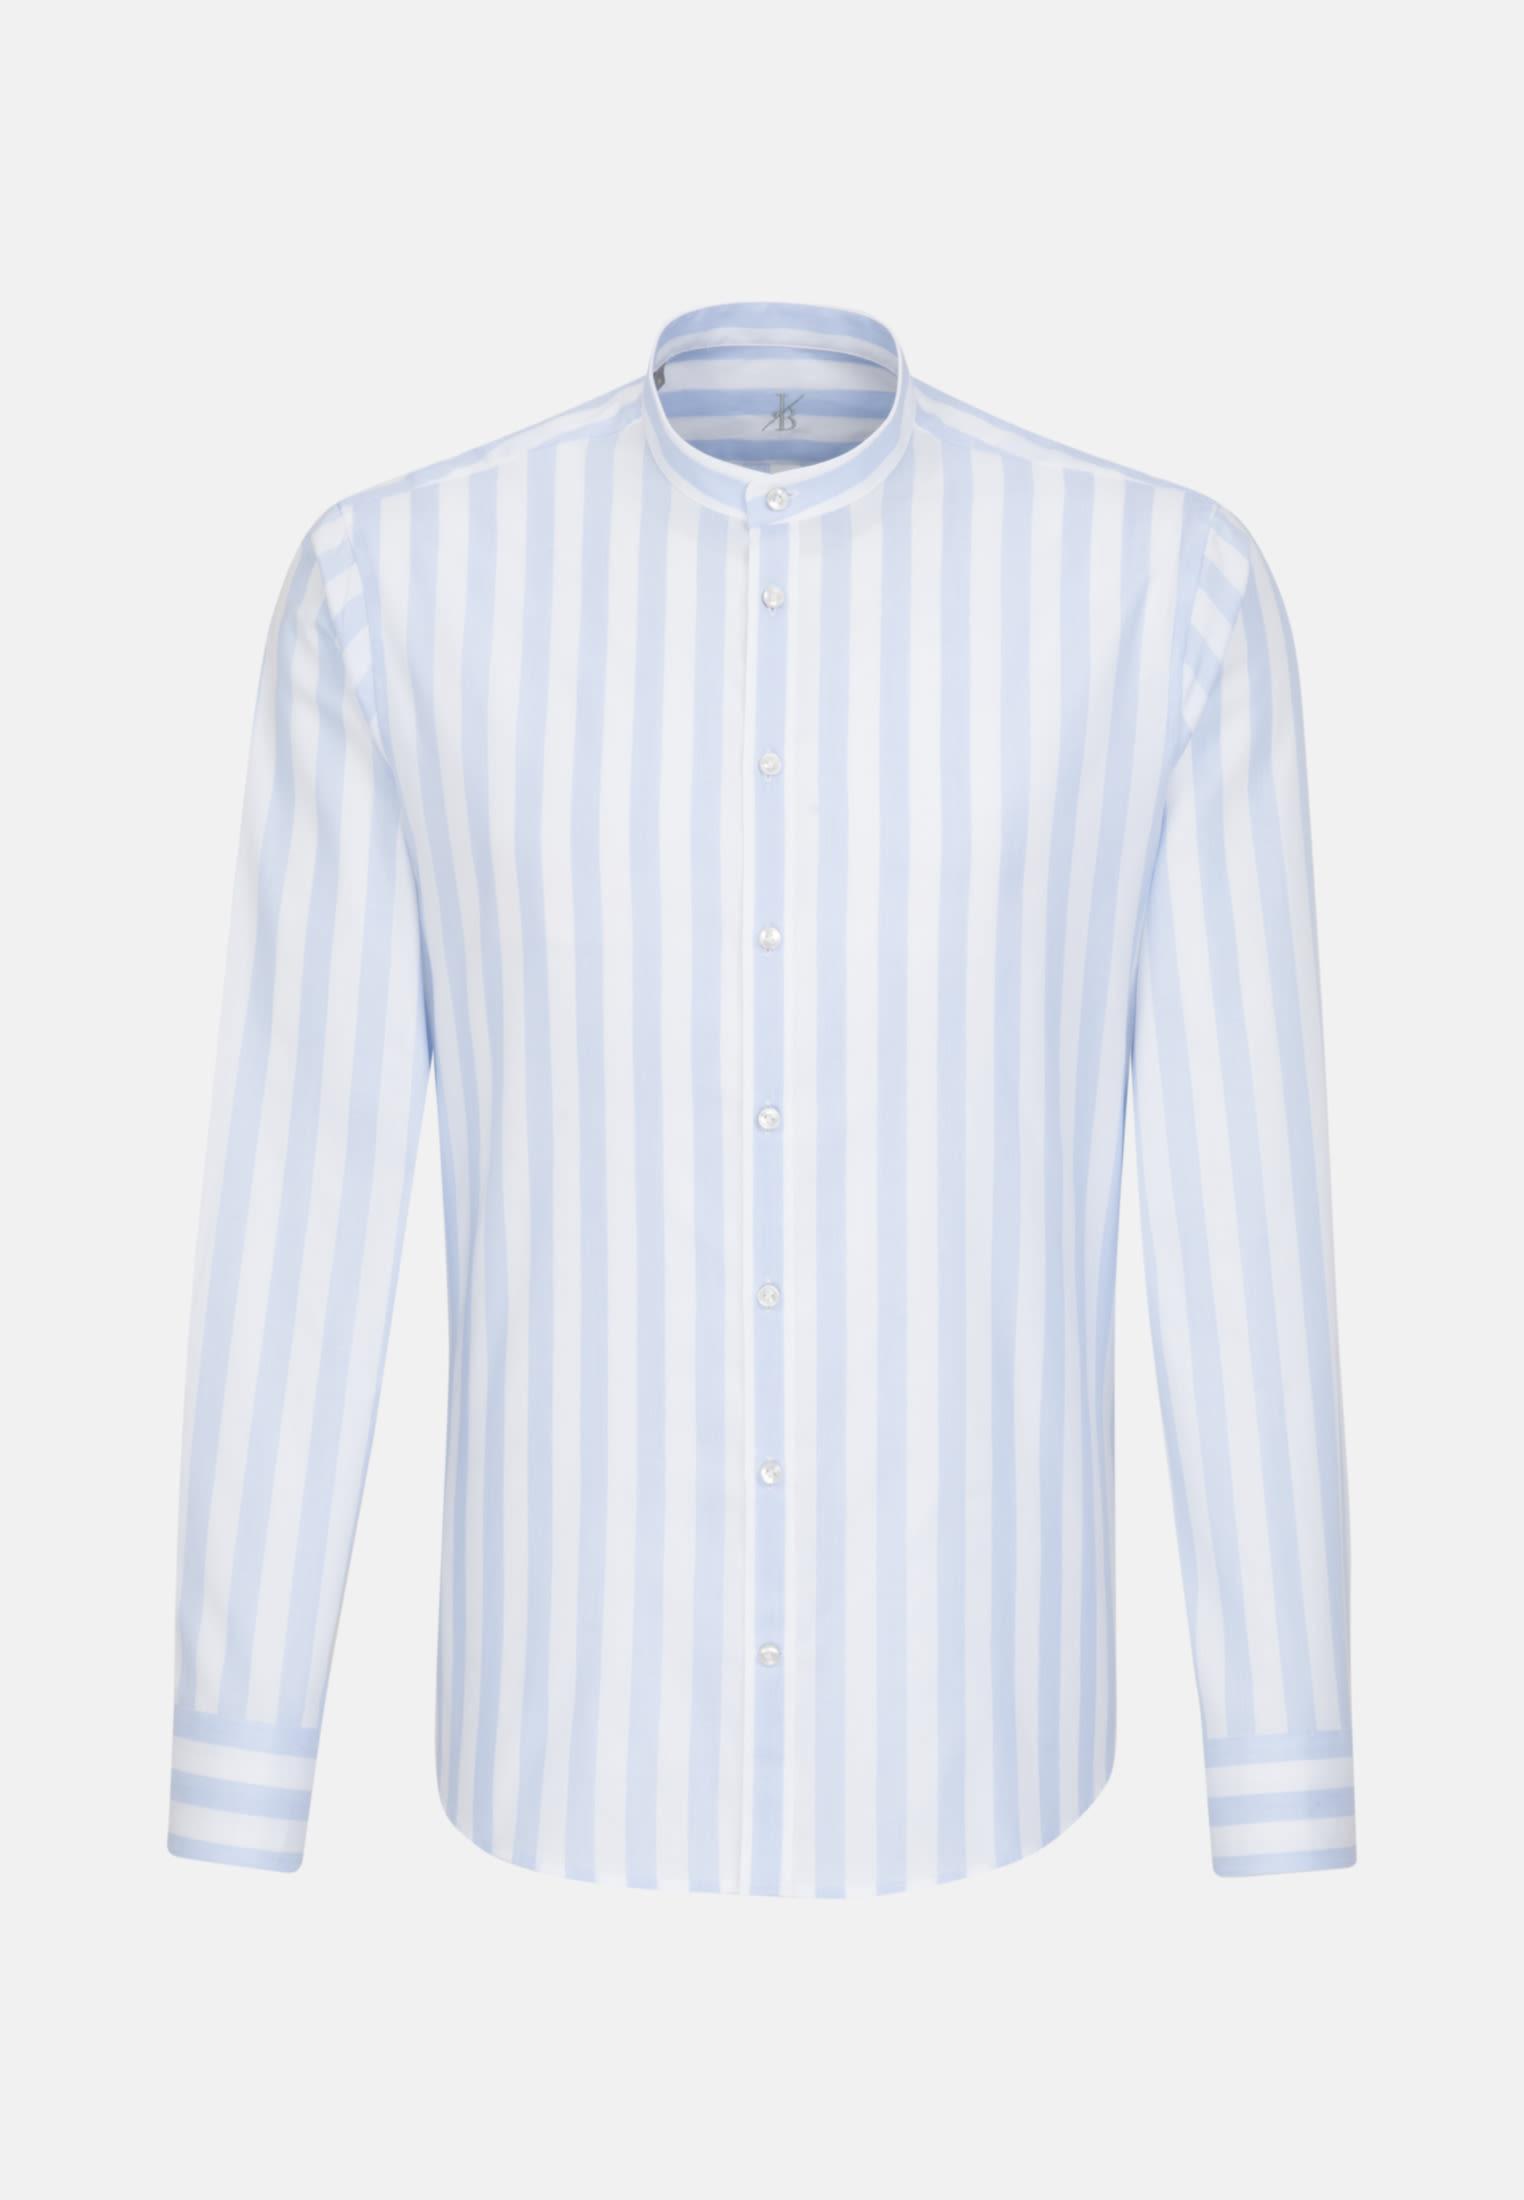 Oxford Smart Casual Hemd in Perfect Fit mit Stehkragen in Hellblau    Jacques Britt Onlineshop